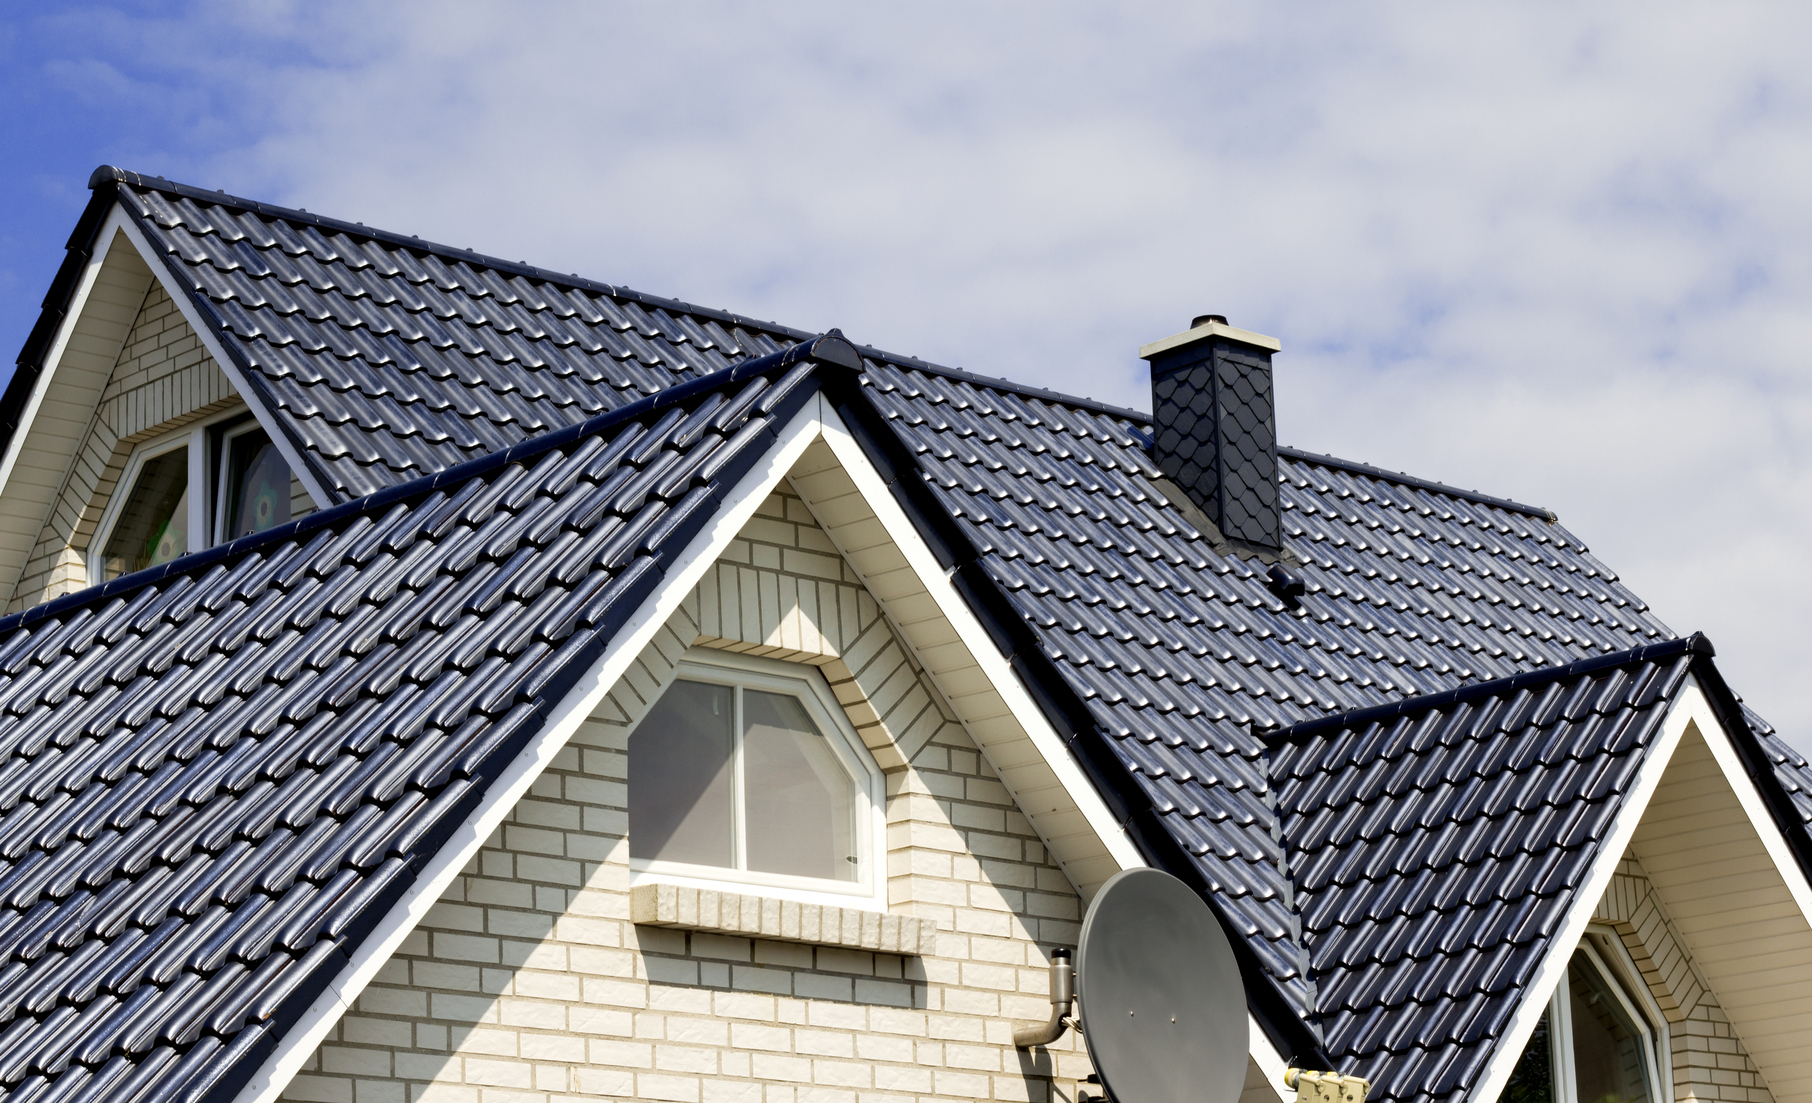 Roof Repair by United Roofing in Clarkesville GA